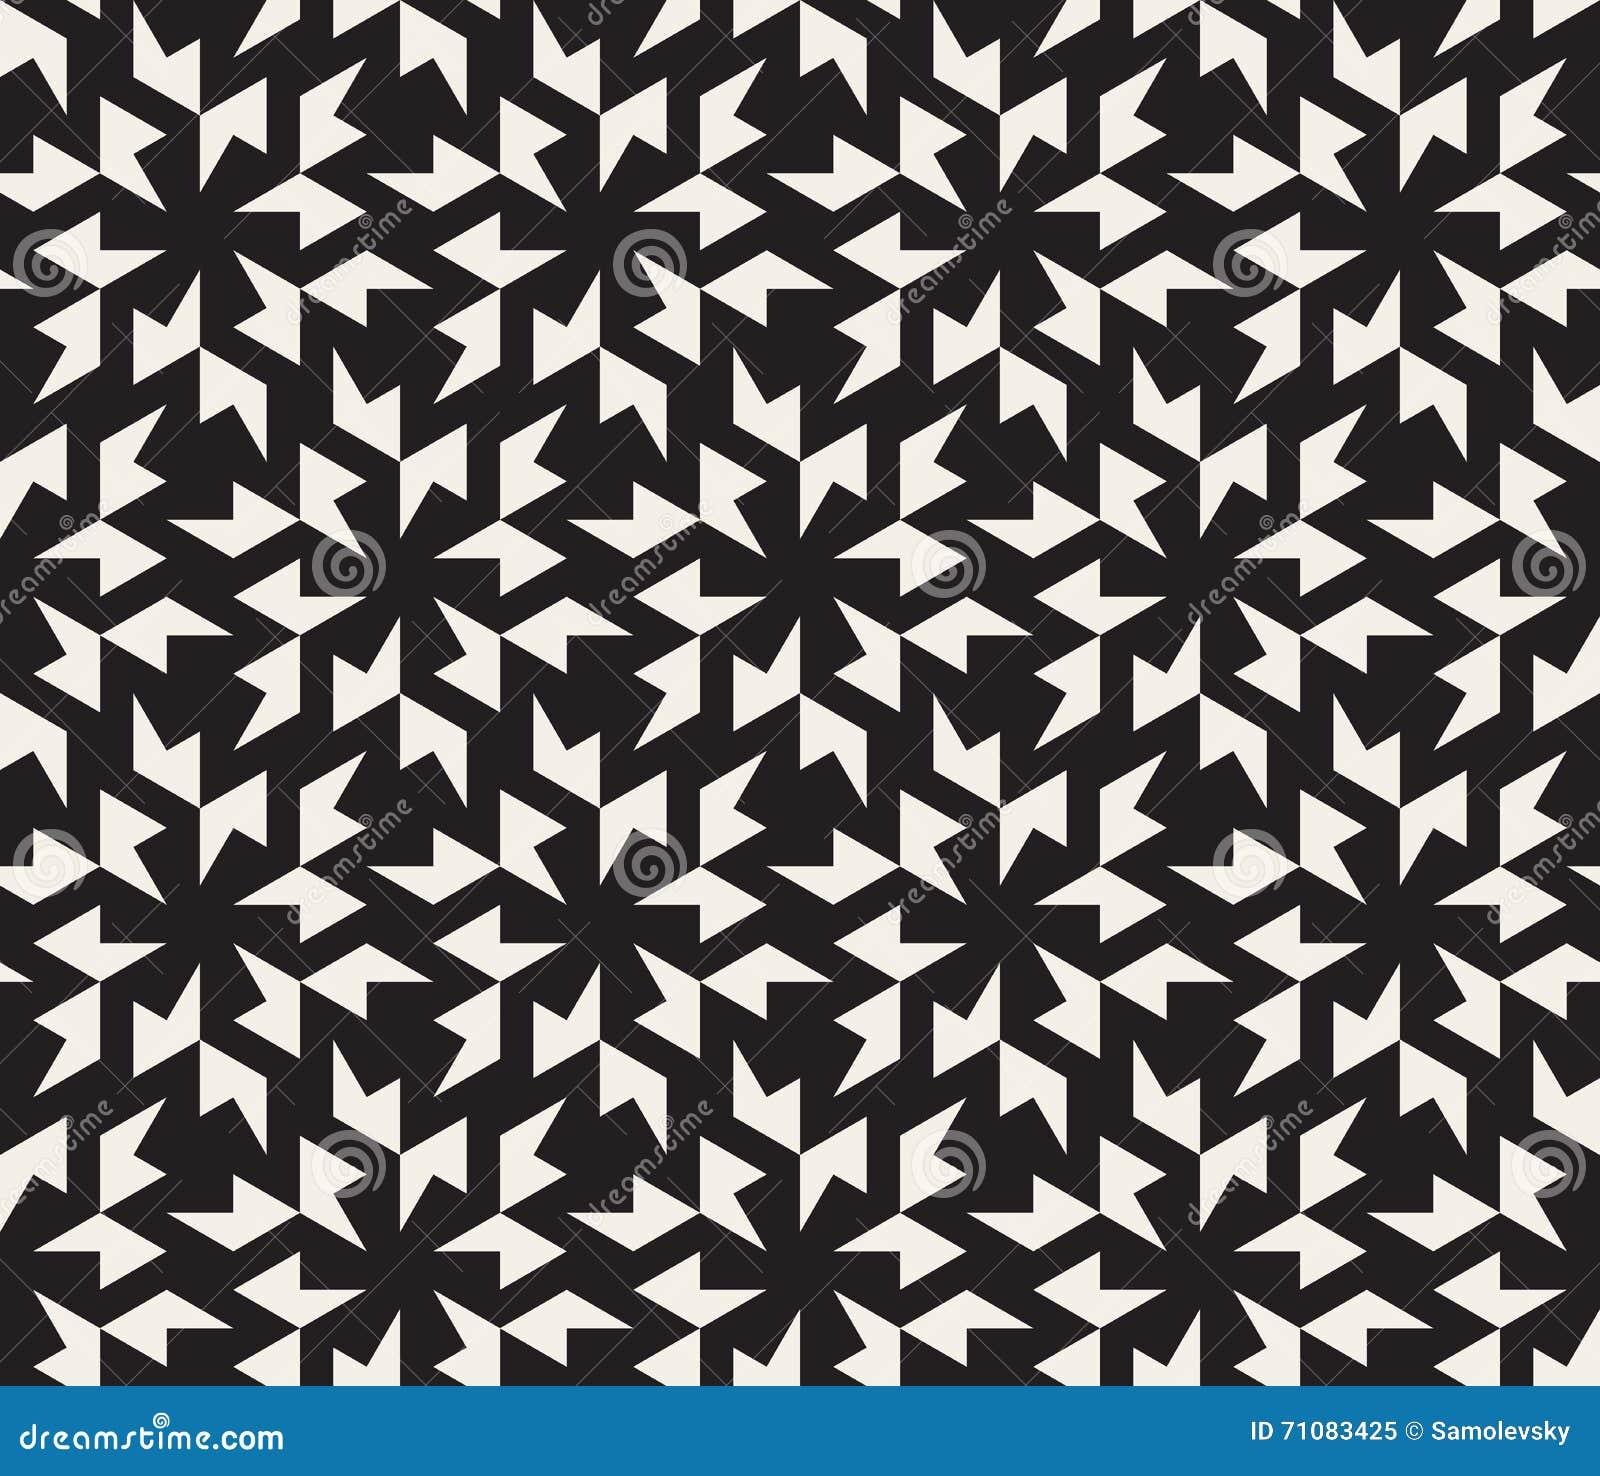 Vector Seamless Black And White Geometric Tessellation